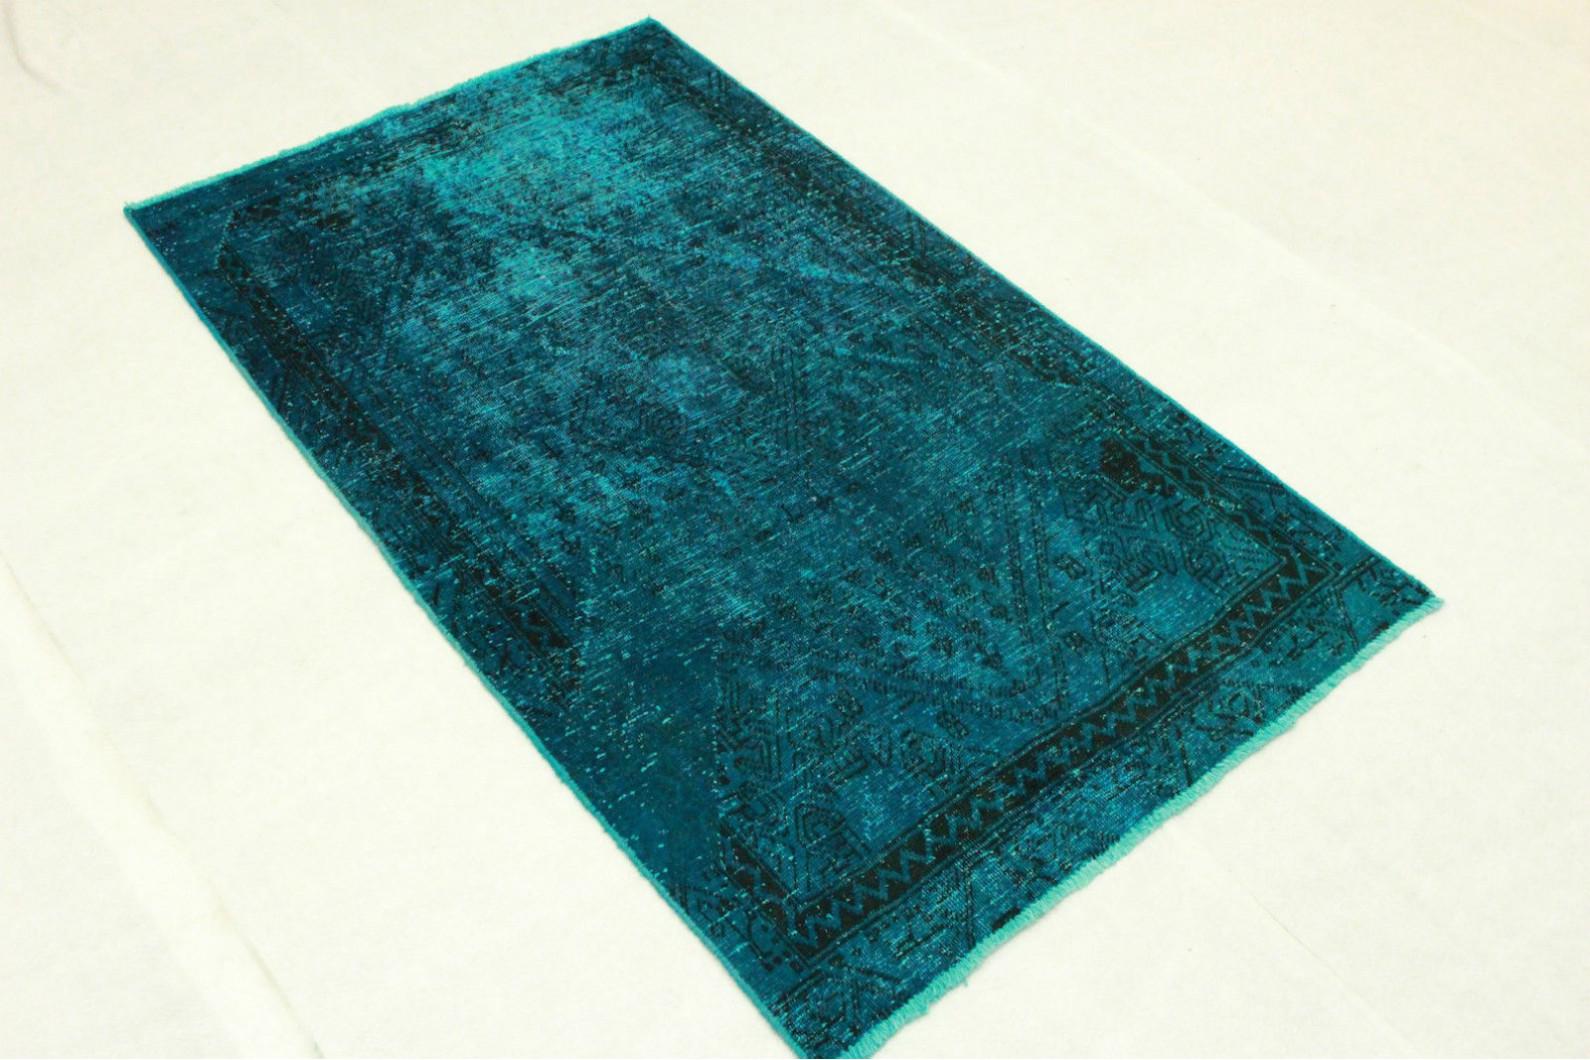 vintage teppich t rkis in 190x110cm 1001 3244 bei. Black Bedroom Furniture Sets. Home Design Ideas